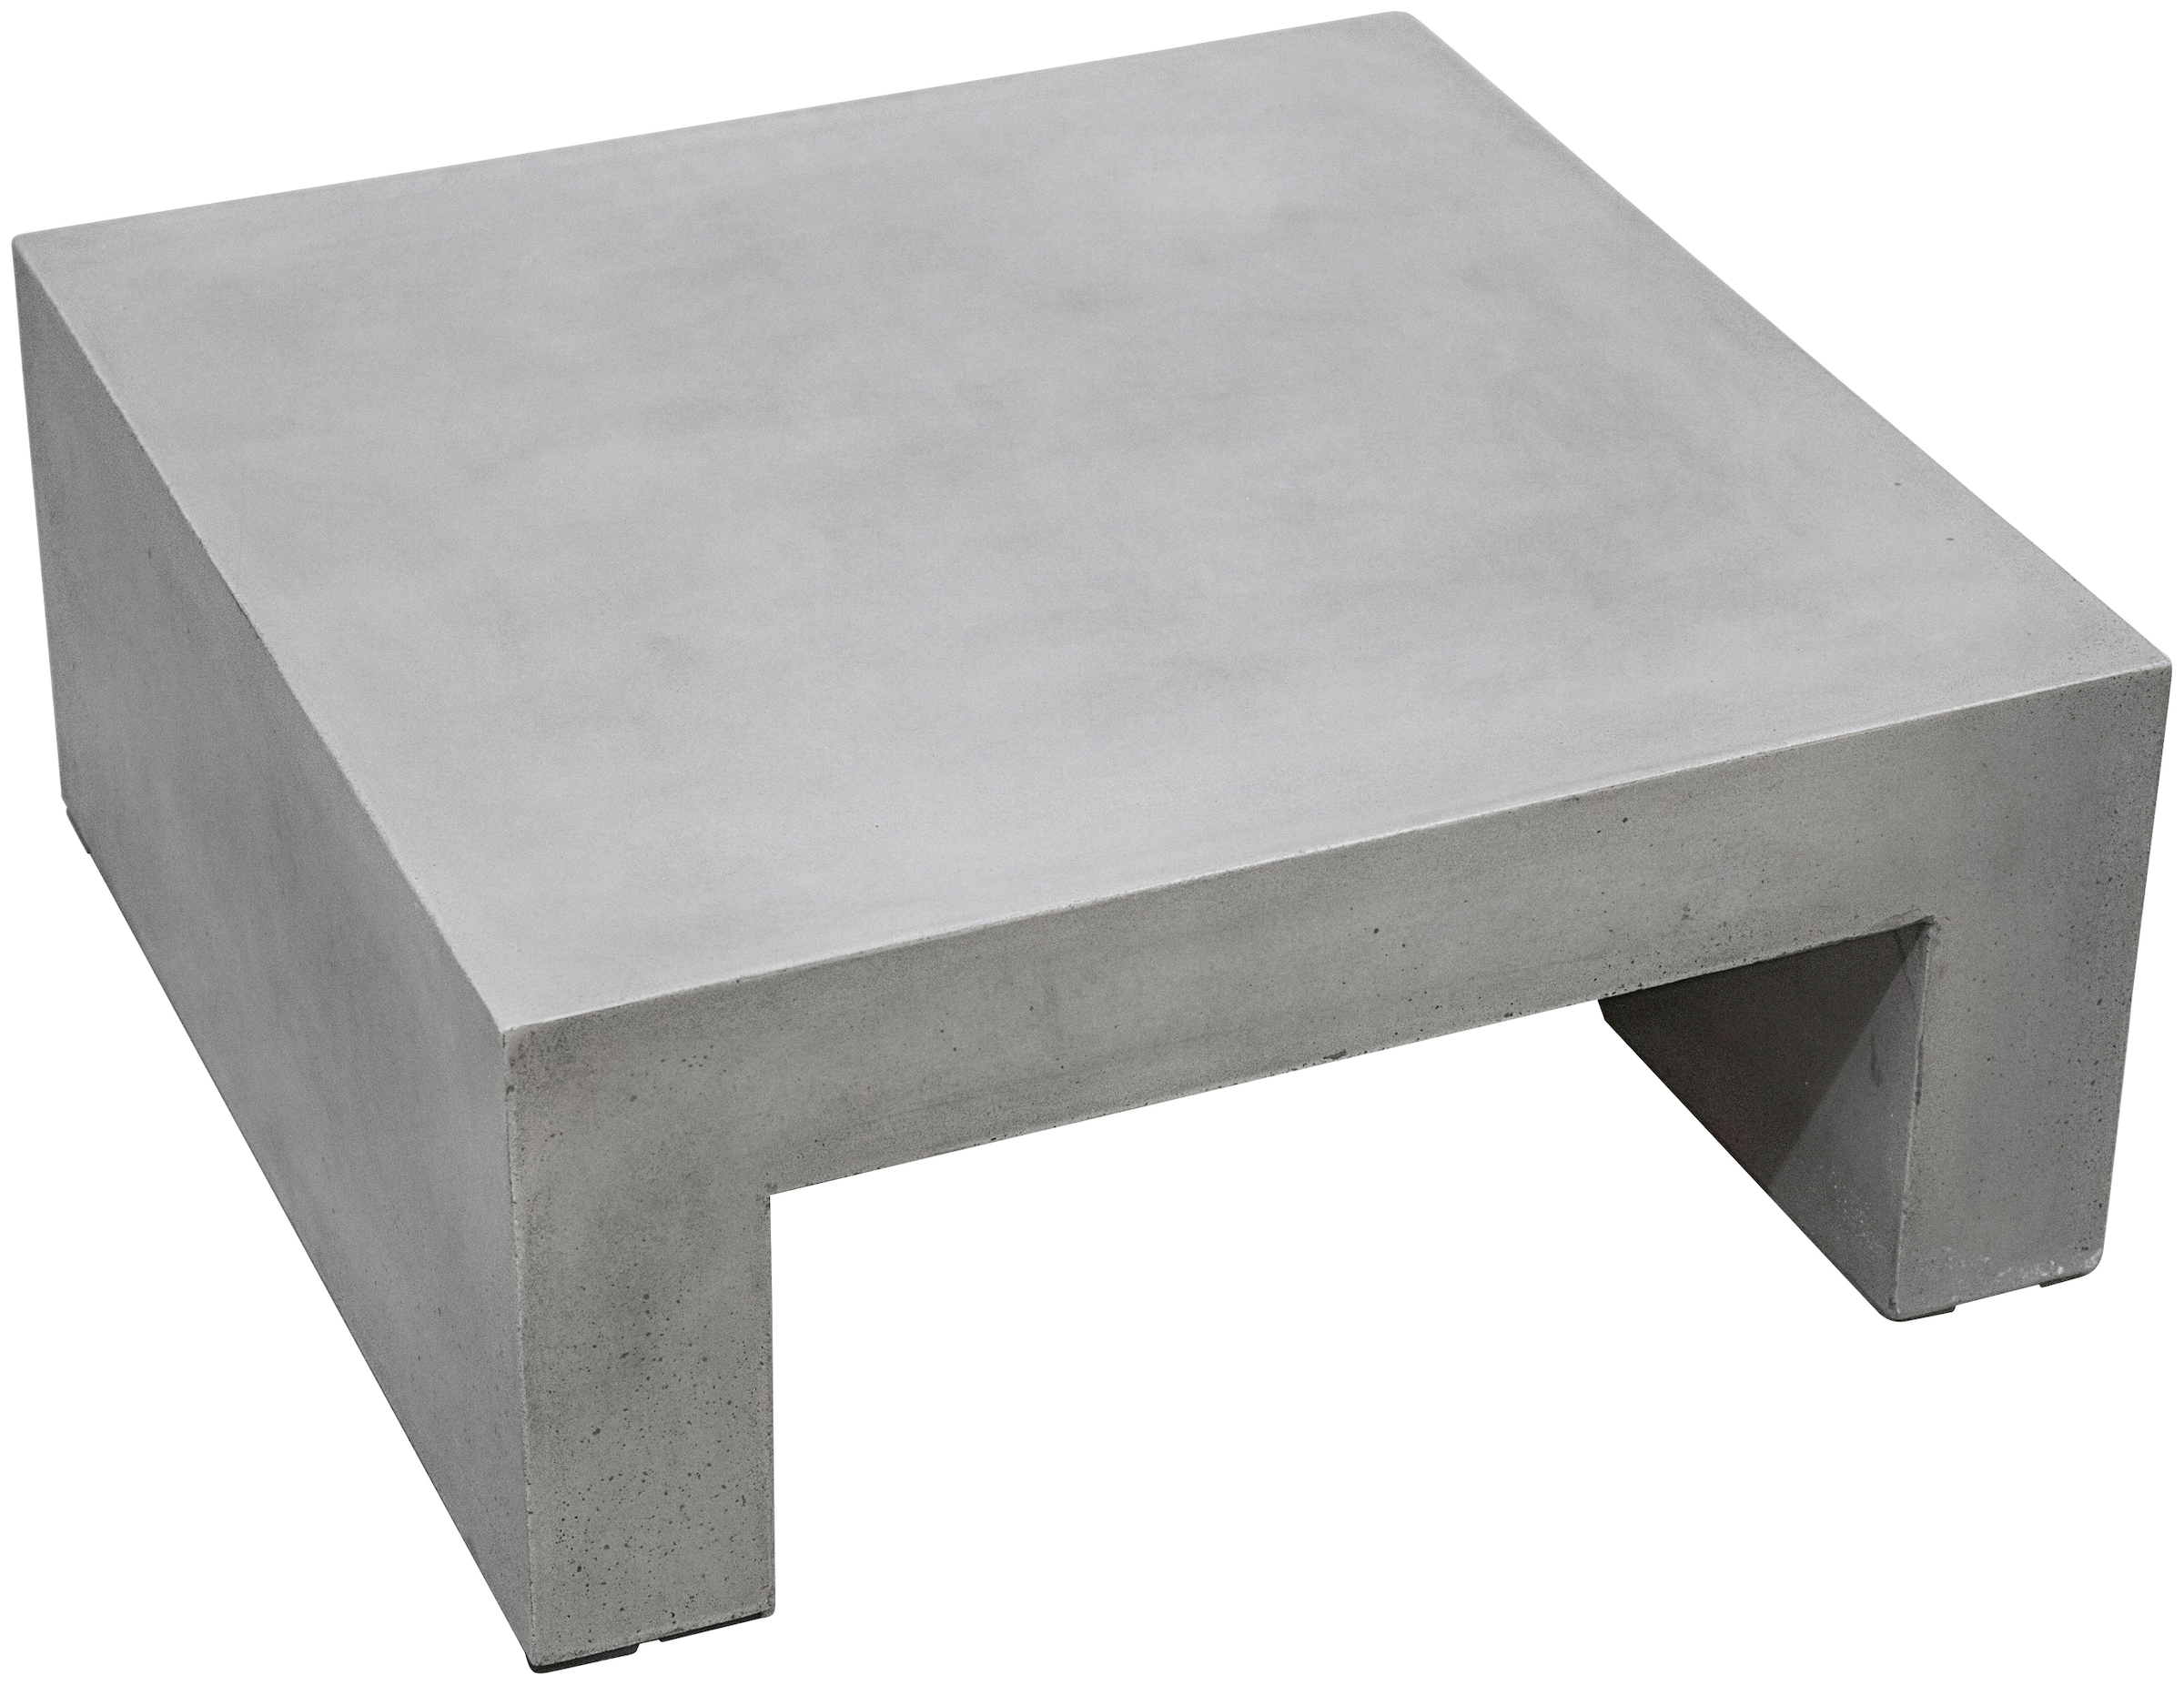 Image of ANDIAMO Gartentisch »Primus«, Beton, Masse (B/H/T) 70x30x70 cm